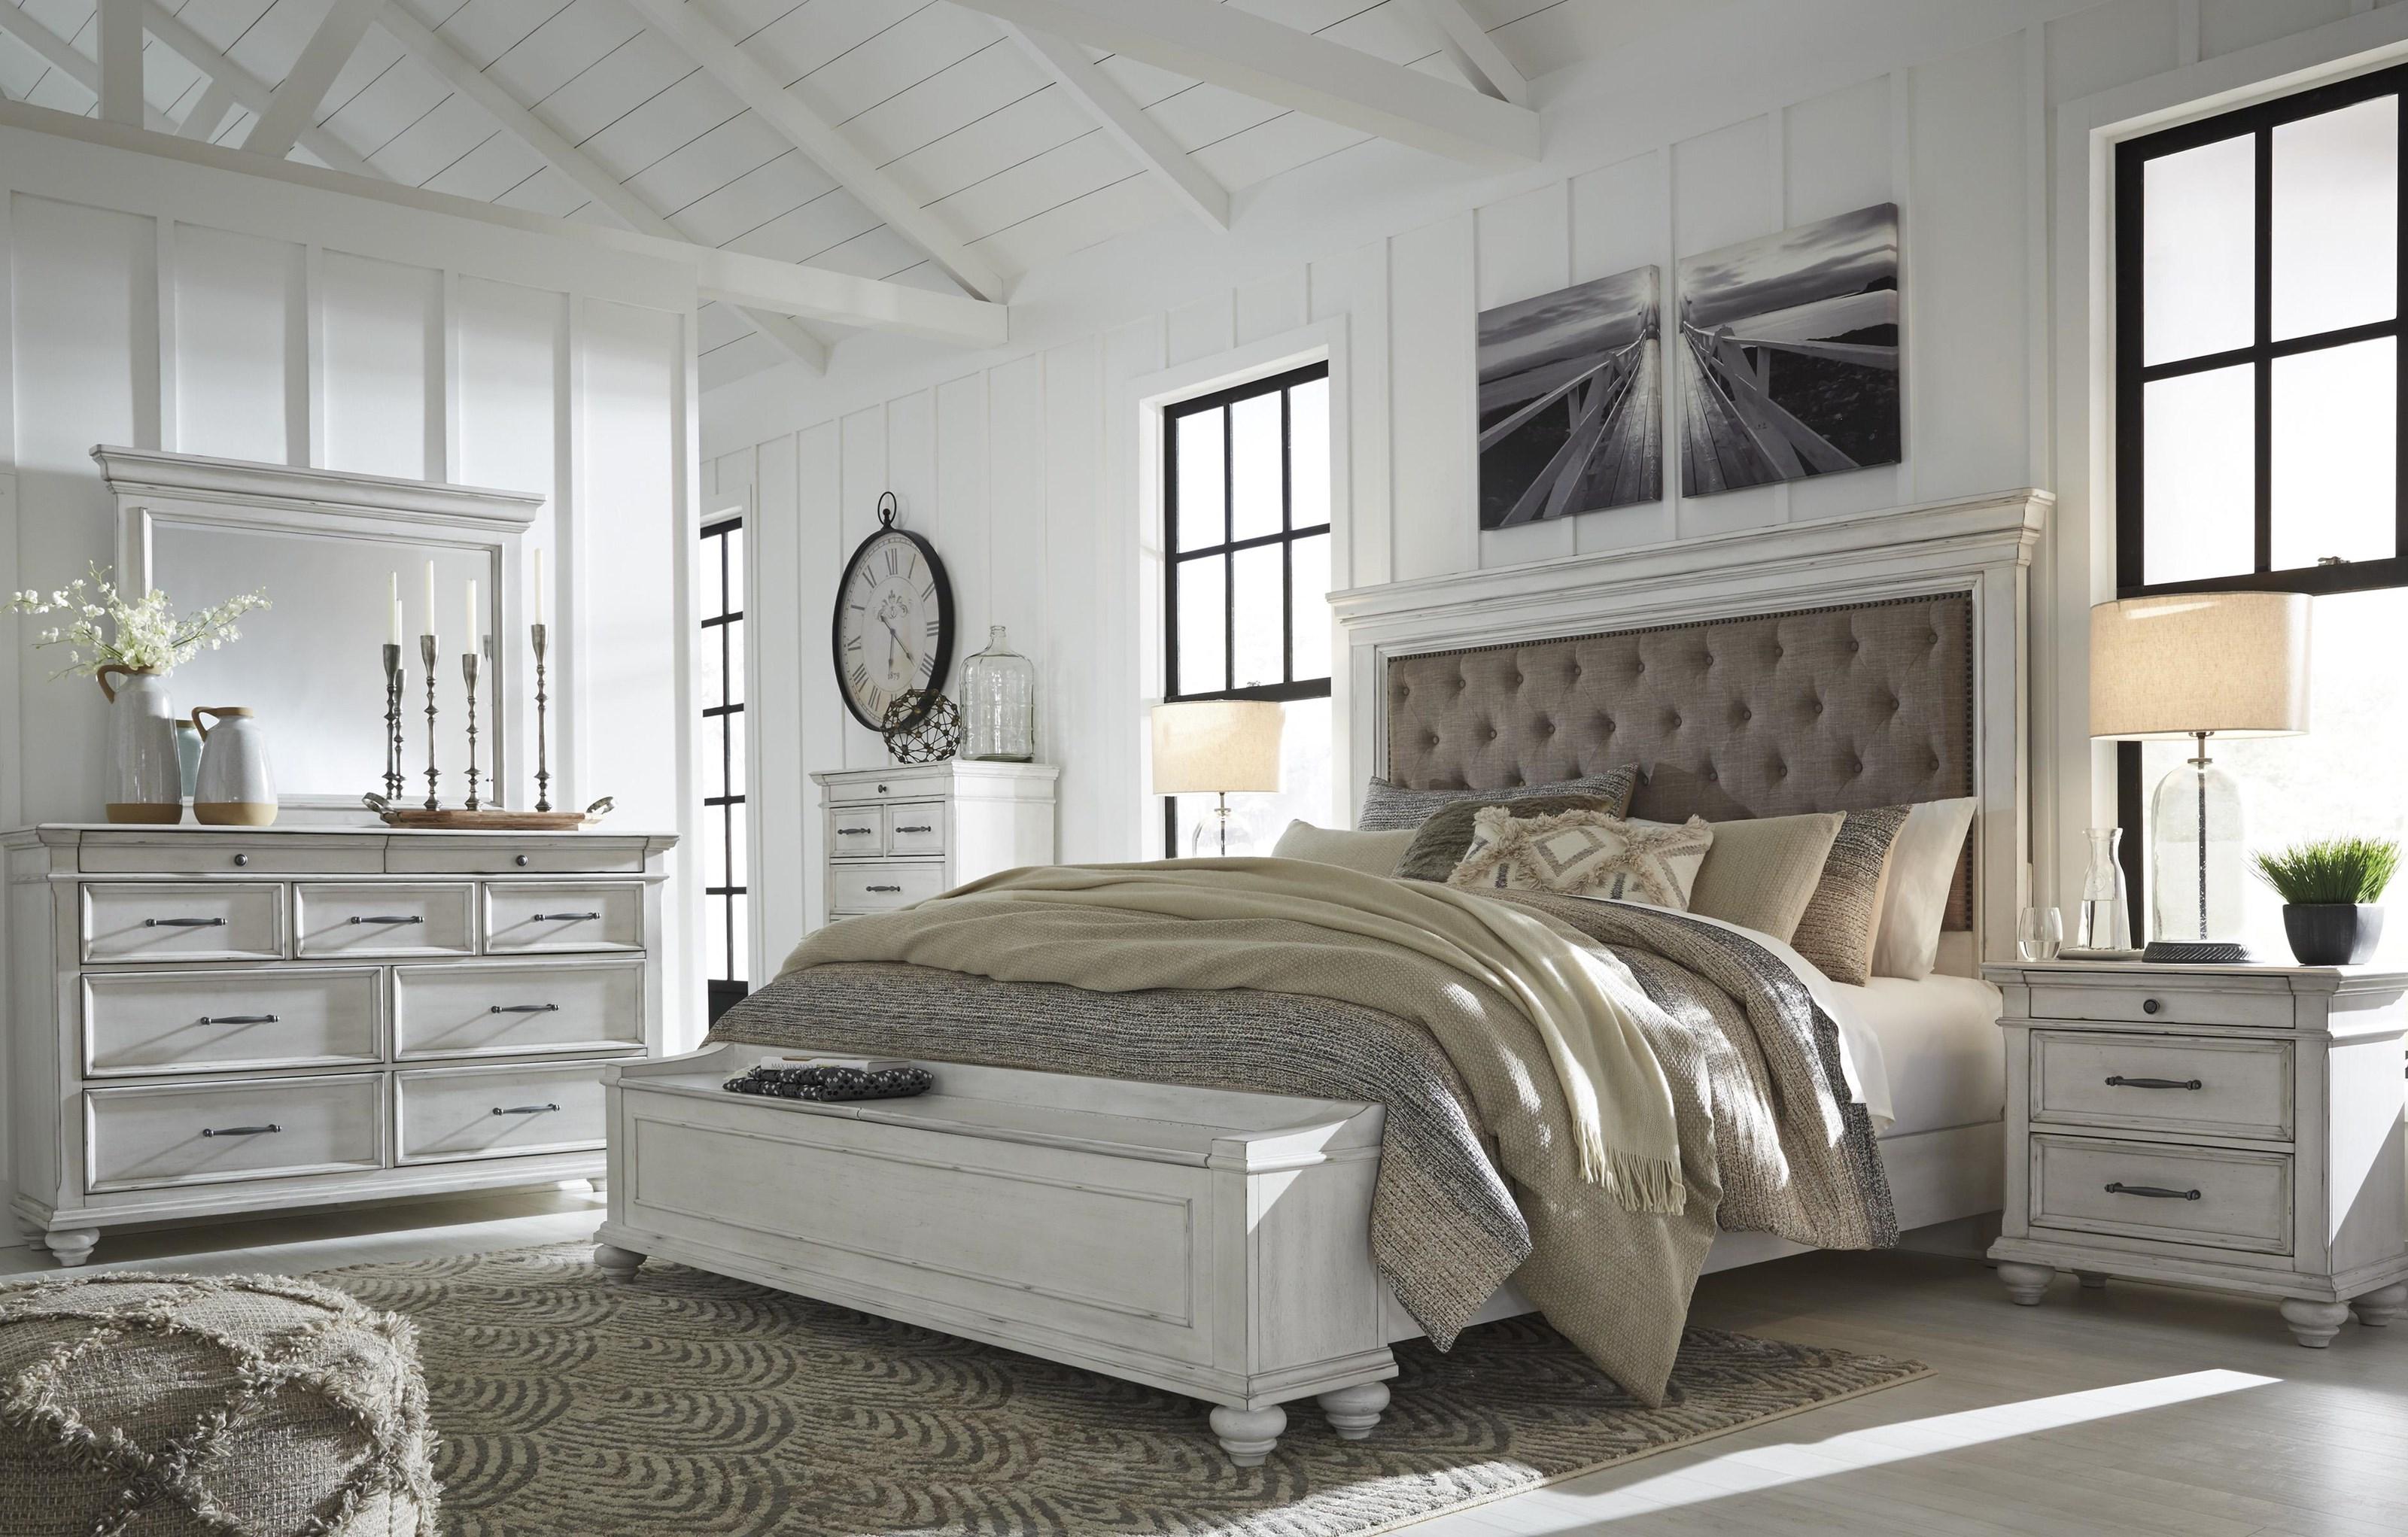 Kanwyn 6 Piece Upholstered King Bedroom Set by Benchcraft at Sam Levitz Furniture